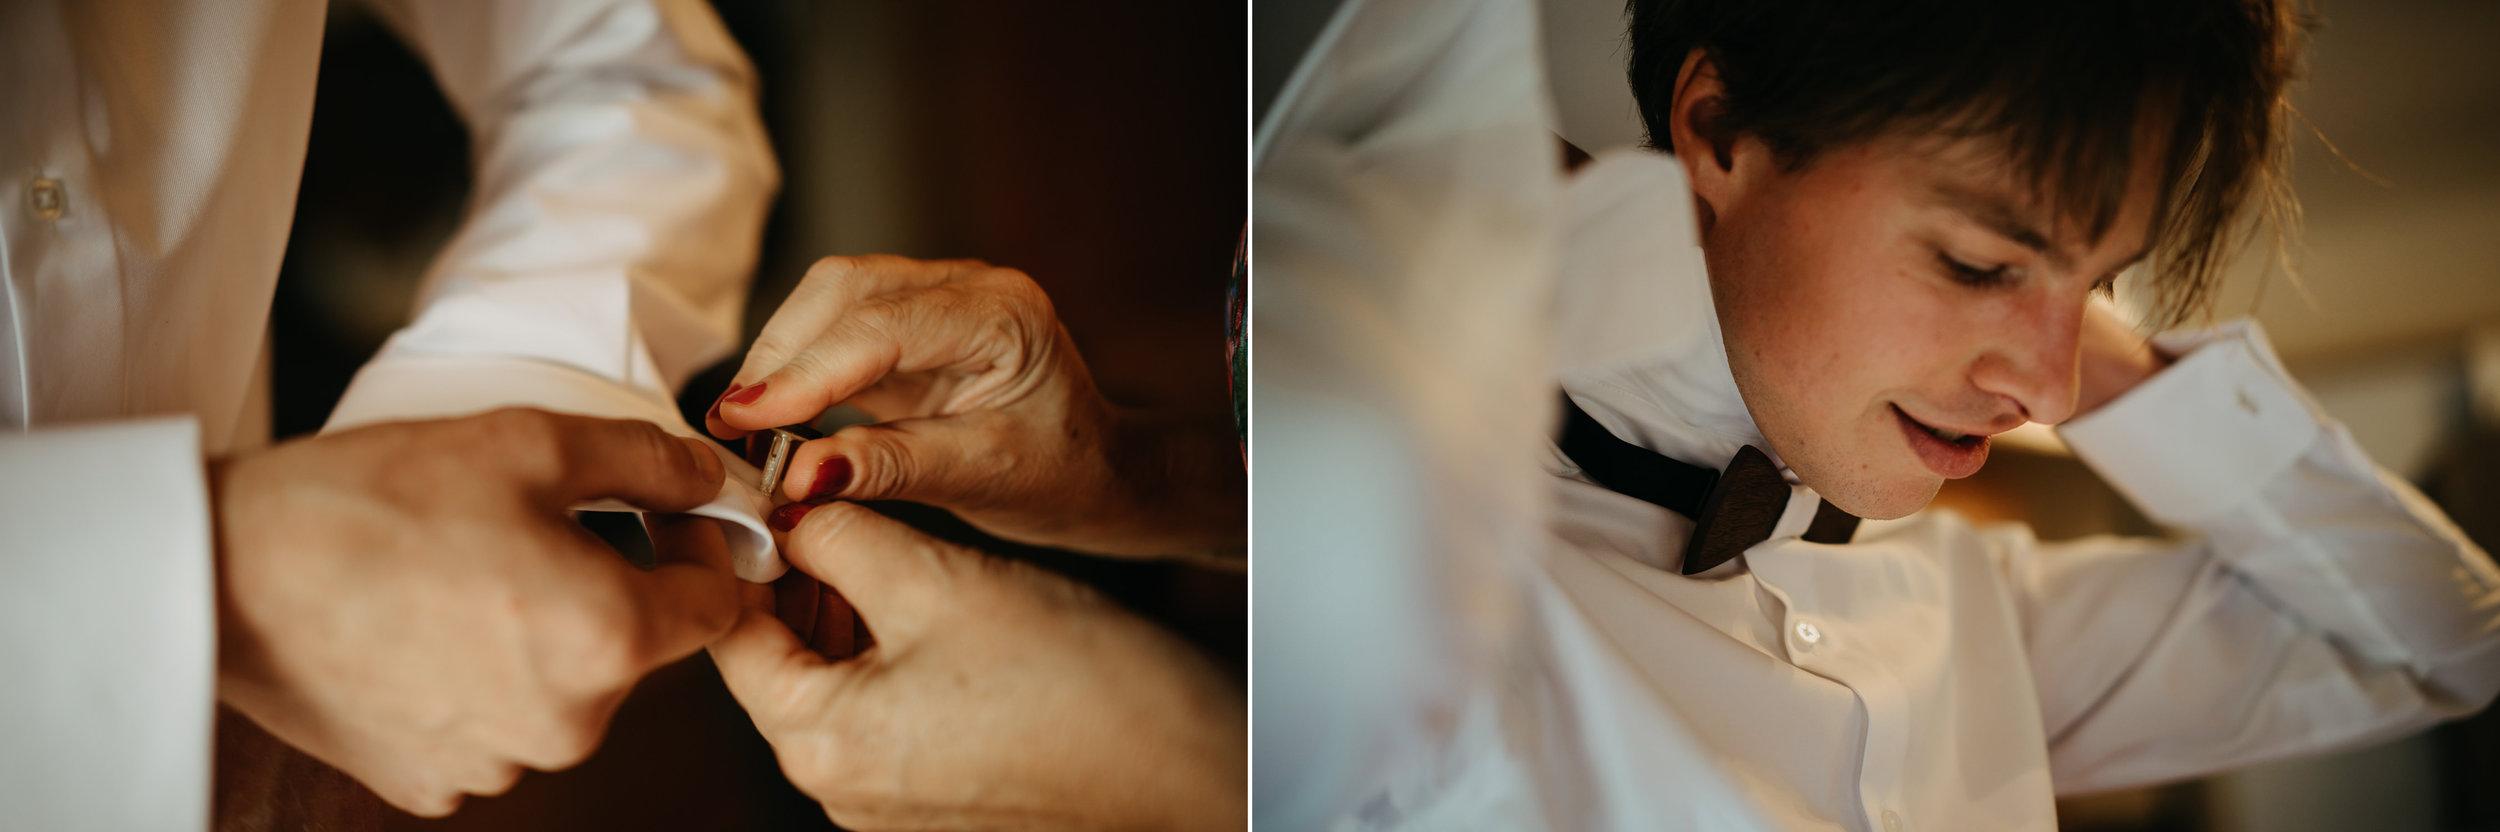 amsterdam-wedding-photographer-bruidsfotografie-trouwfotograaf-mark-hadden-Lucie-Luuk-042 copy.jpg